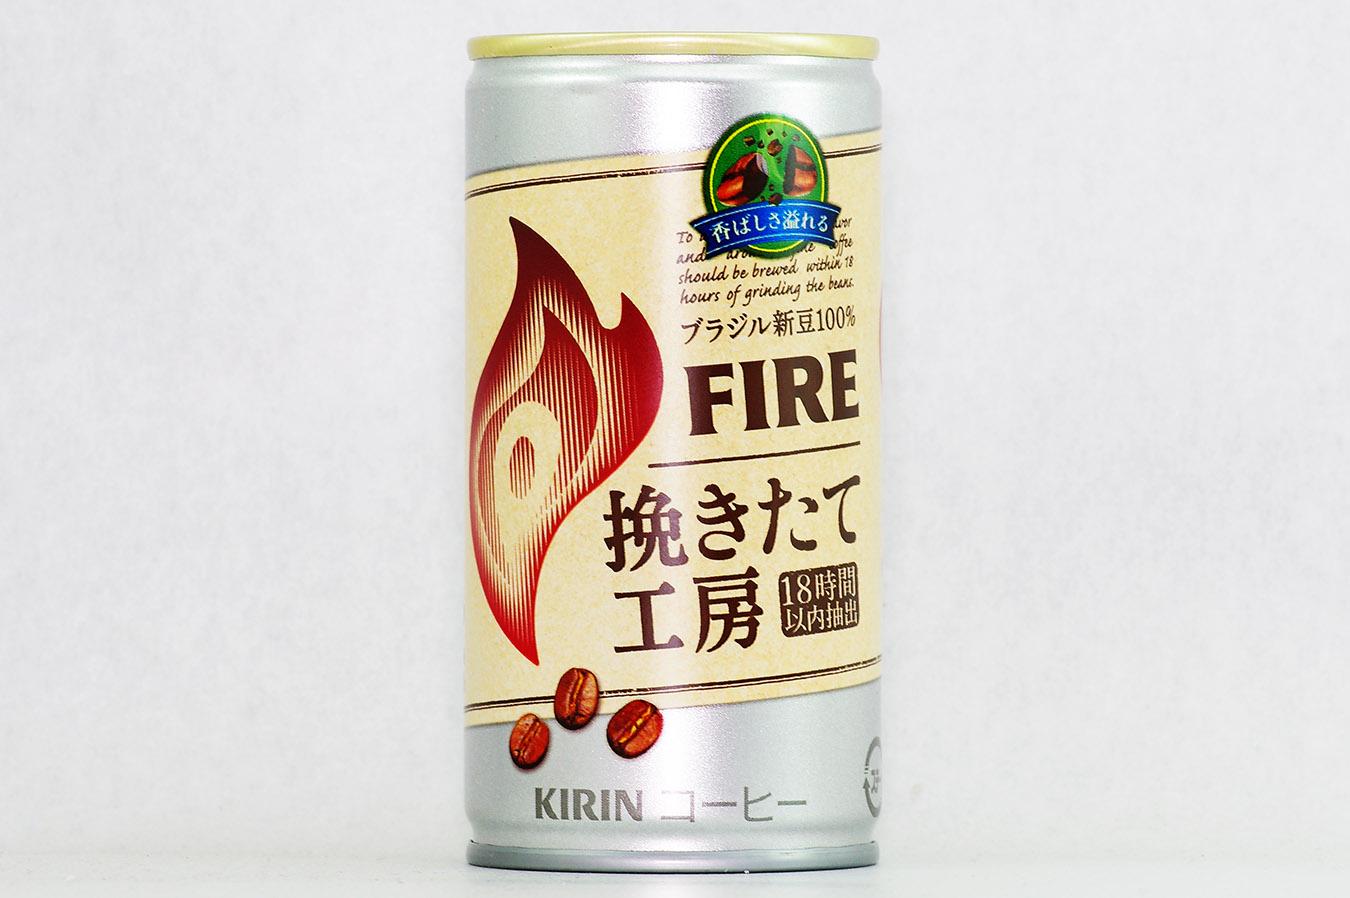 FIRE 挽きたて工房